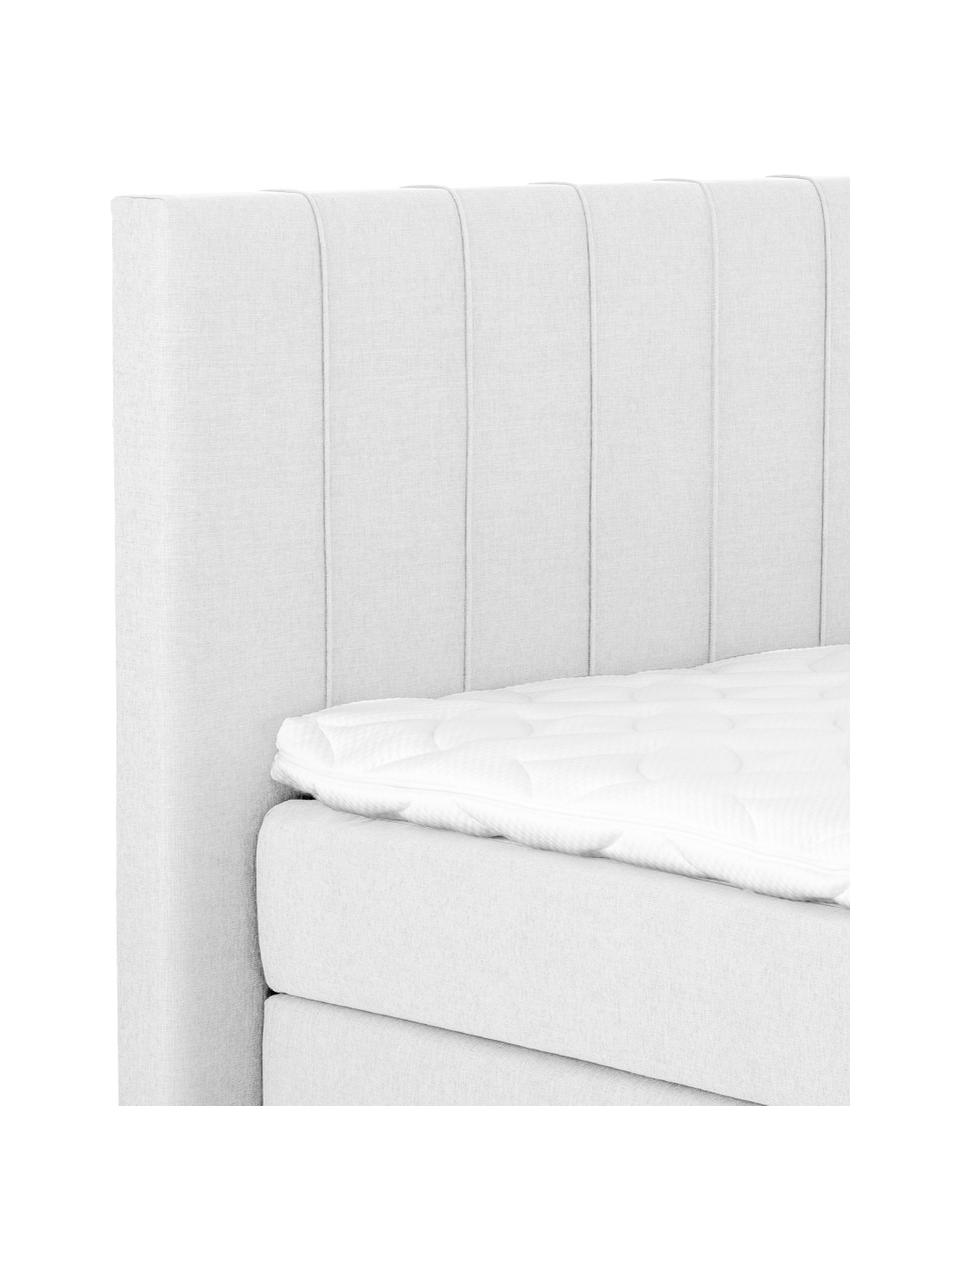 Premium boxspring bed Lacey in lichtgrijs, Matras: 7-zones-pocketverenkern m, Poten: massief gelakt beukenhout, Geweven stof lichtgrijs, 140 x 200 cm